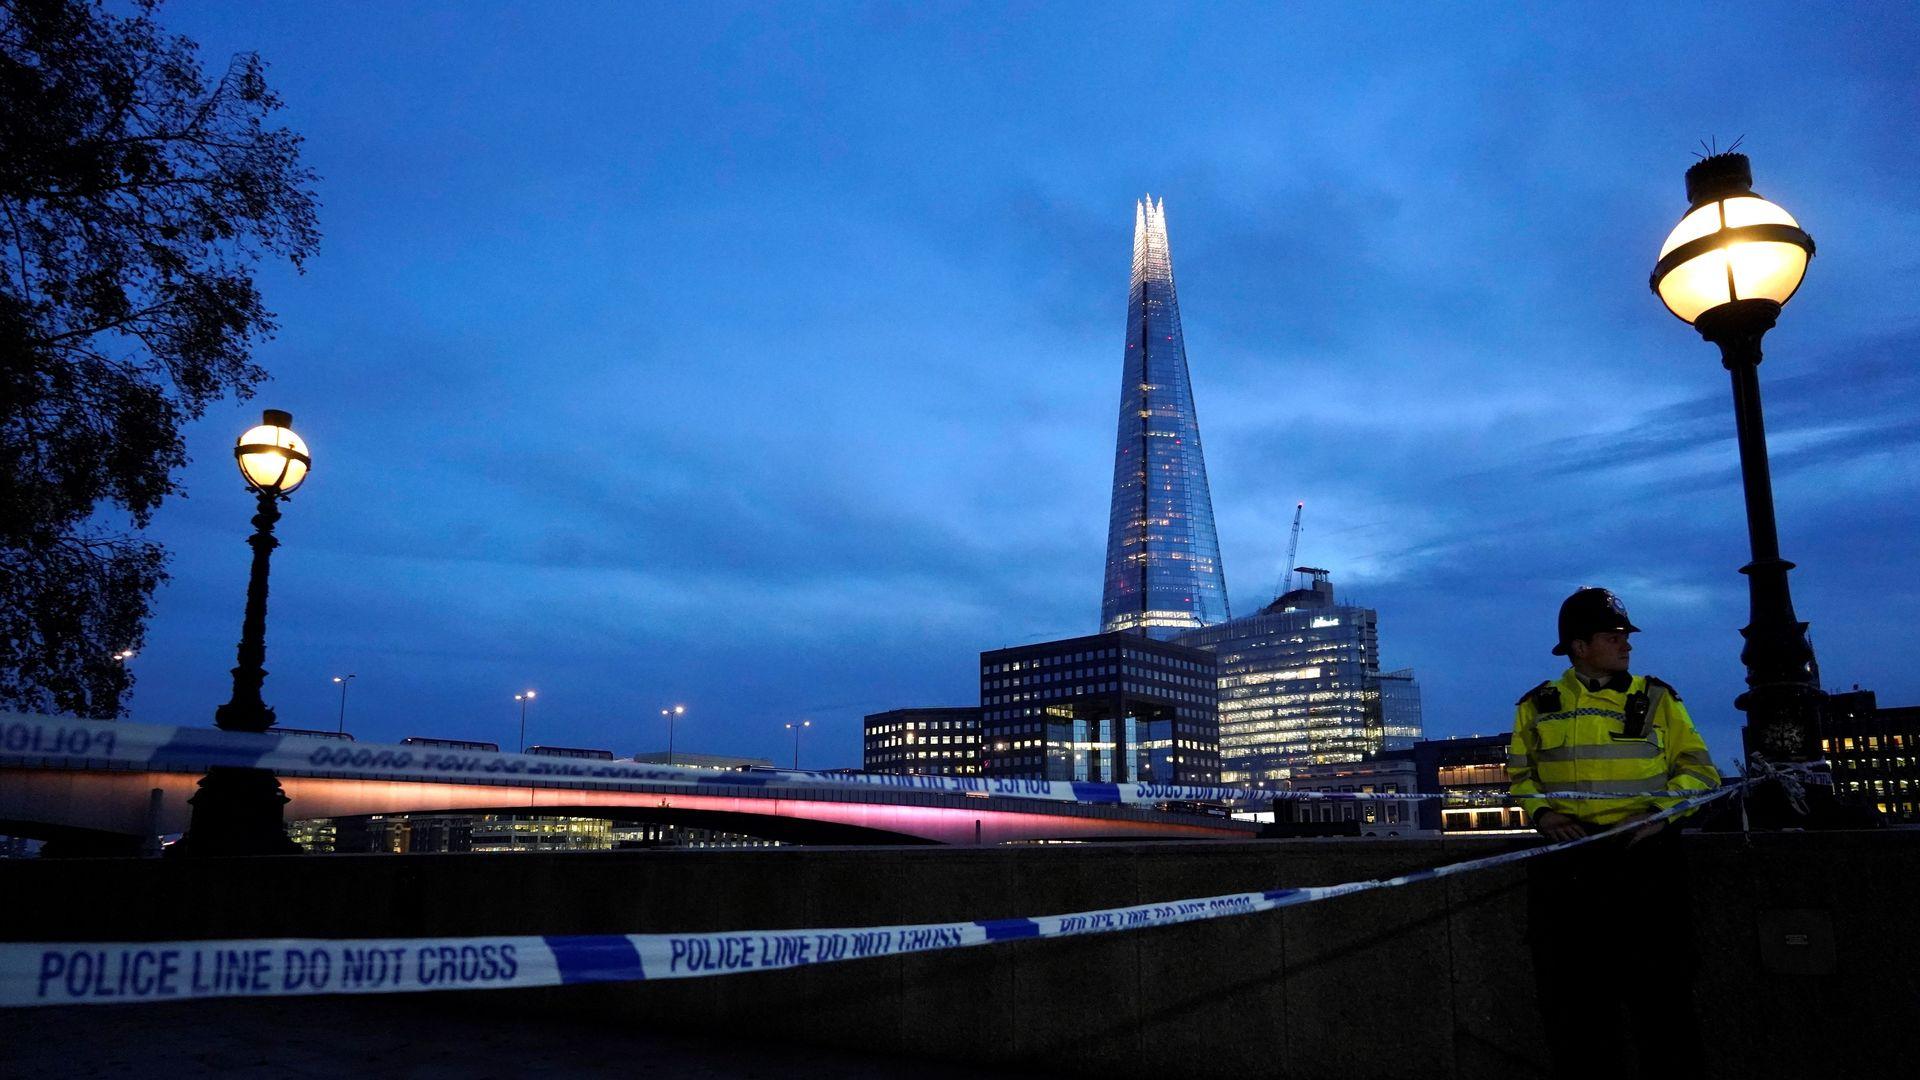 A police officers patrols near London Bridge in London, on November 30